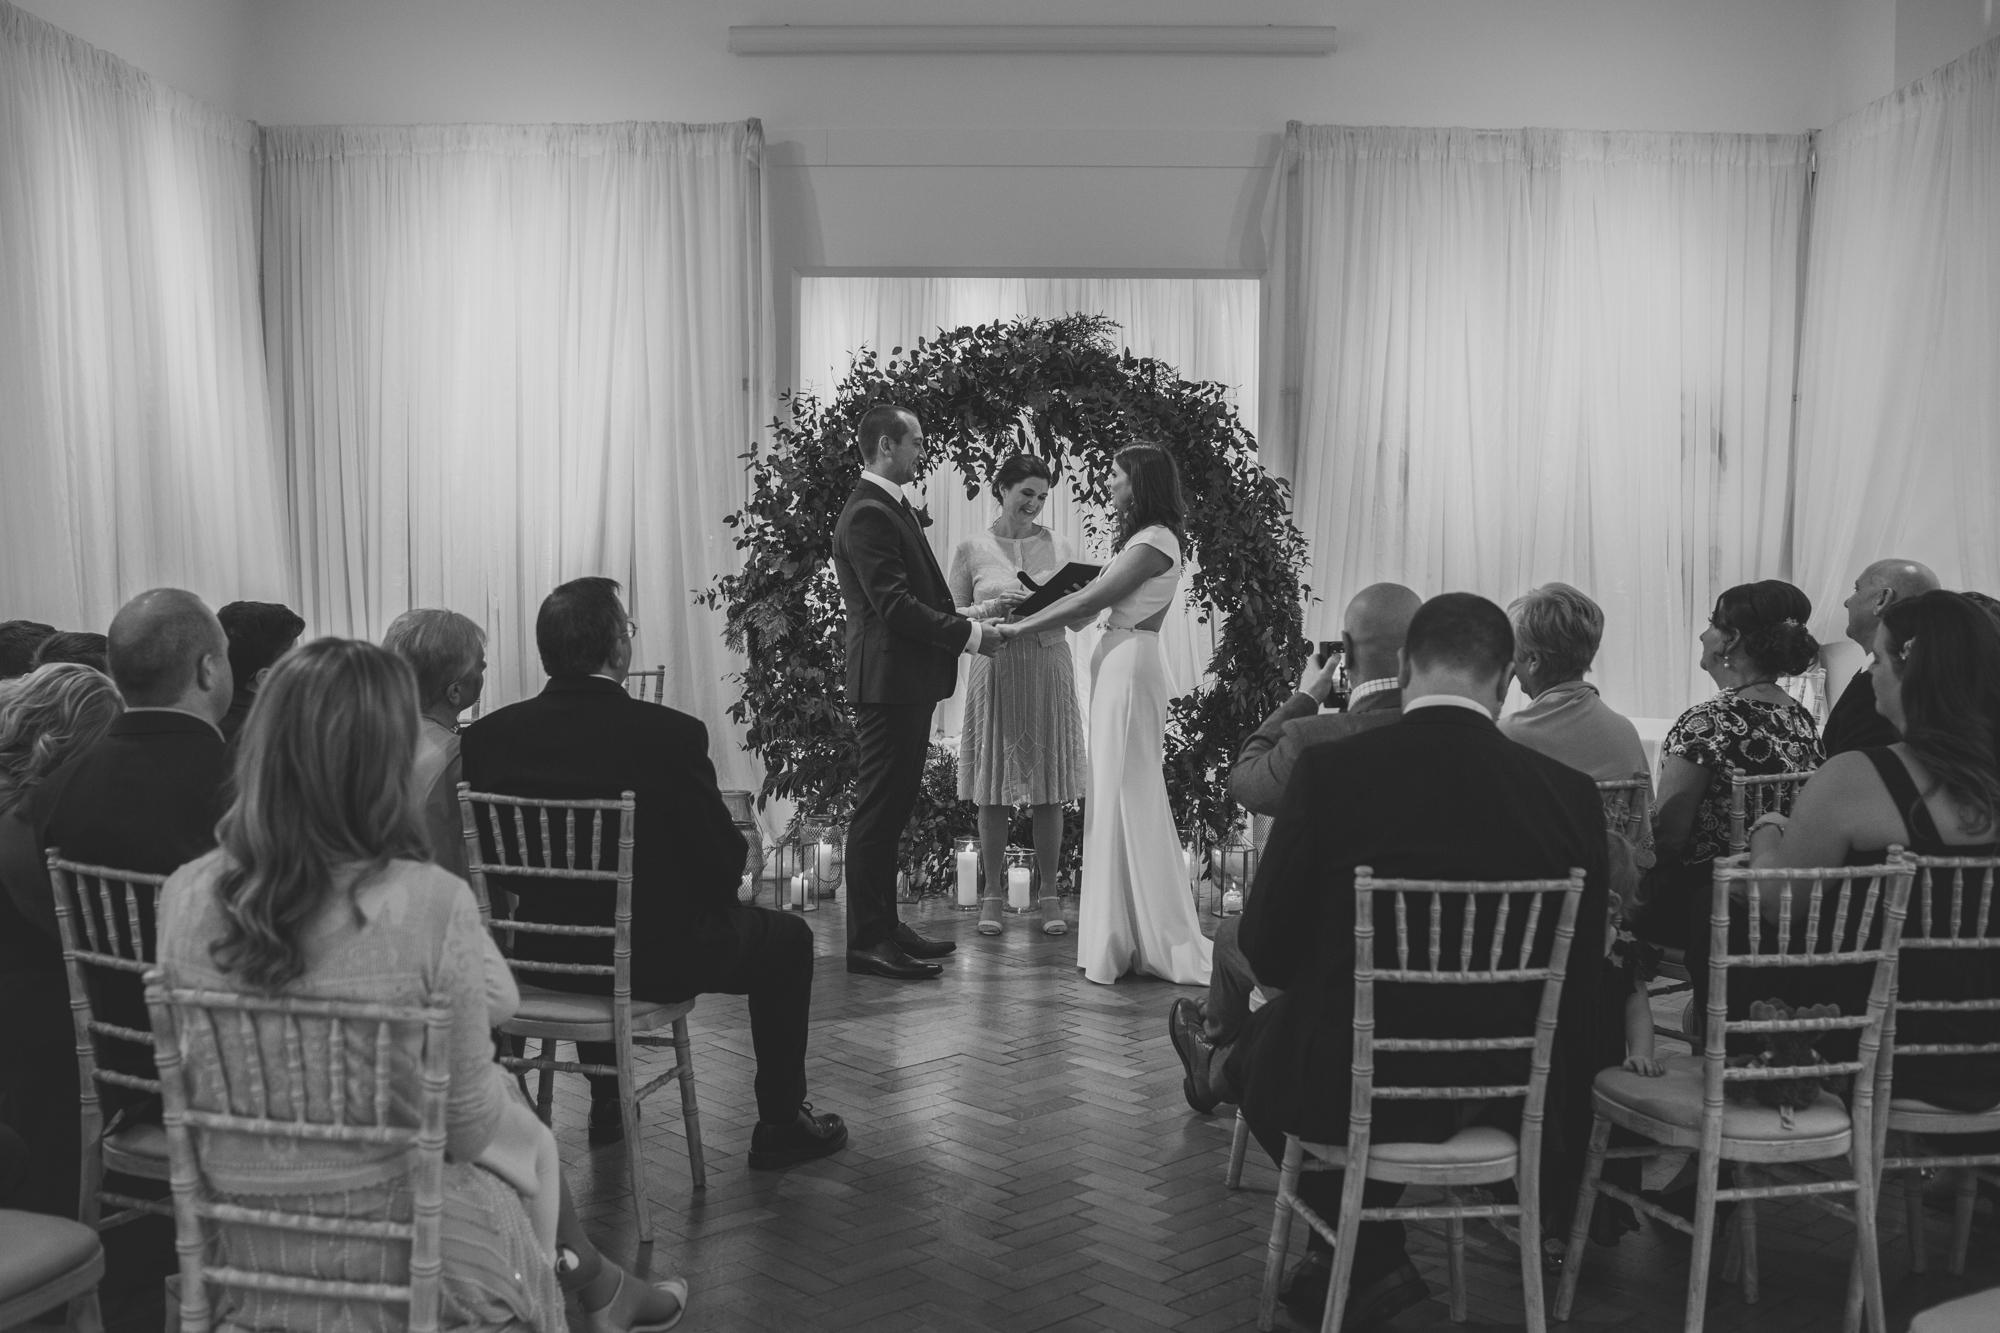 City_Centre_northern_ireland_wedding_inspire_weddings_15.jpg